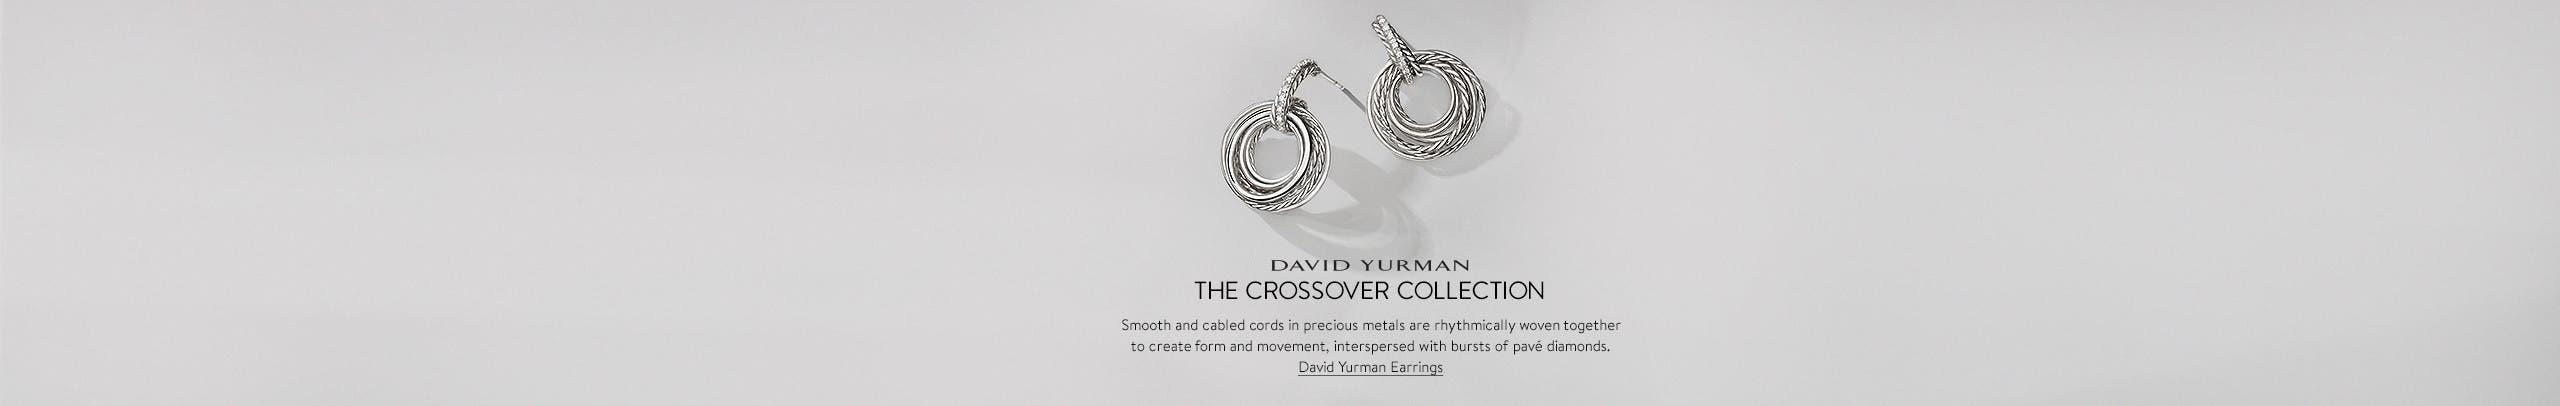 David Yurman: the Crossover Collection.